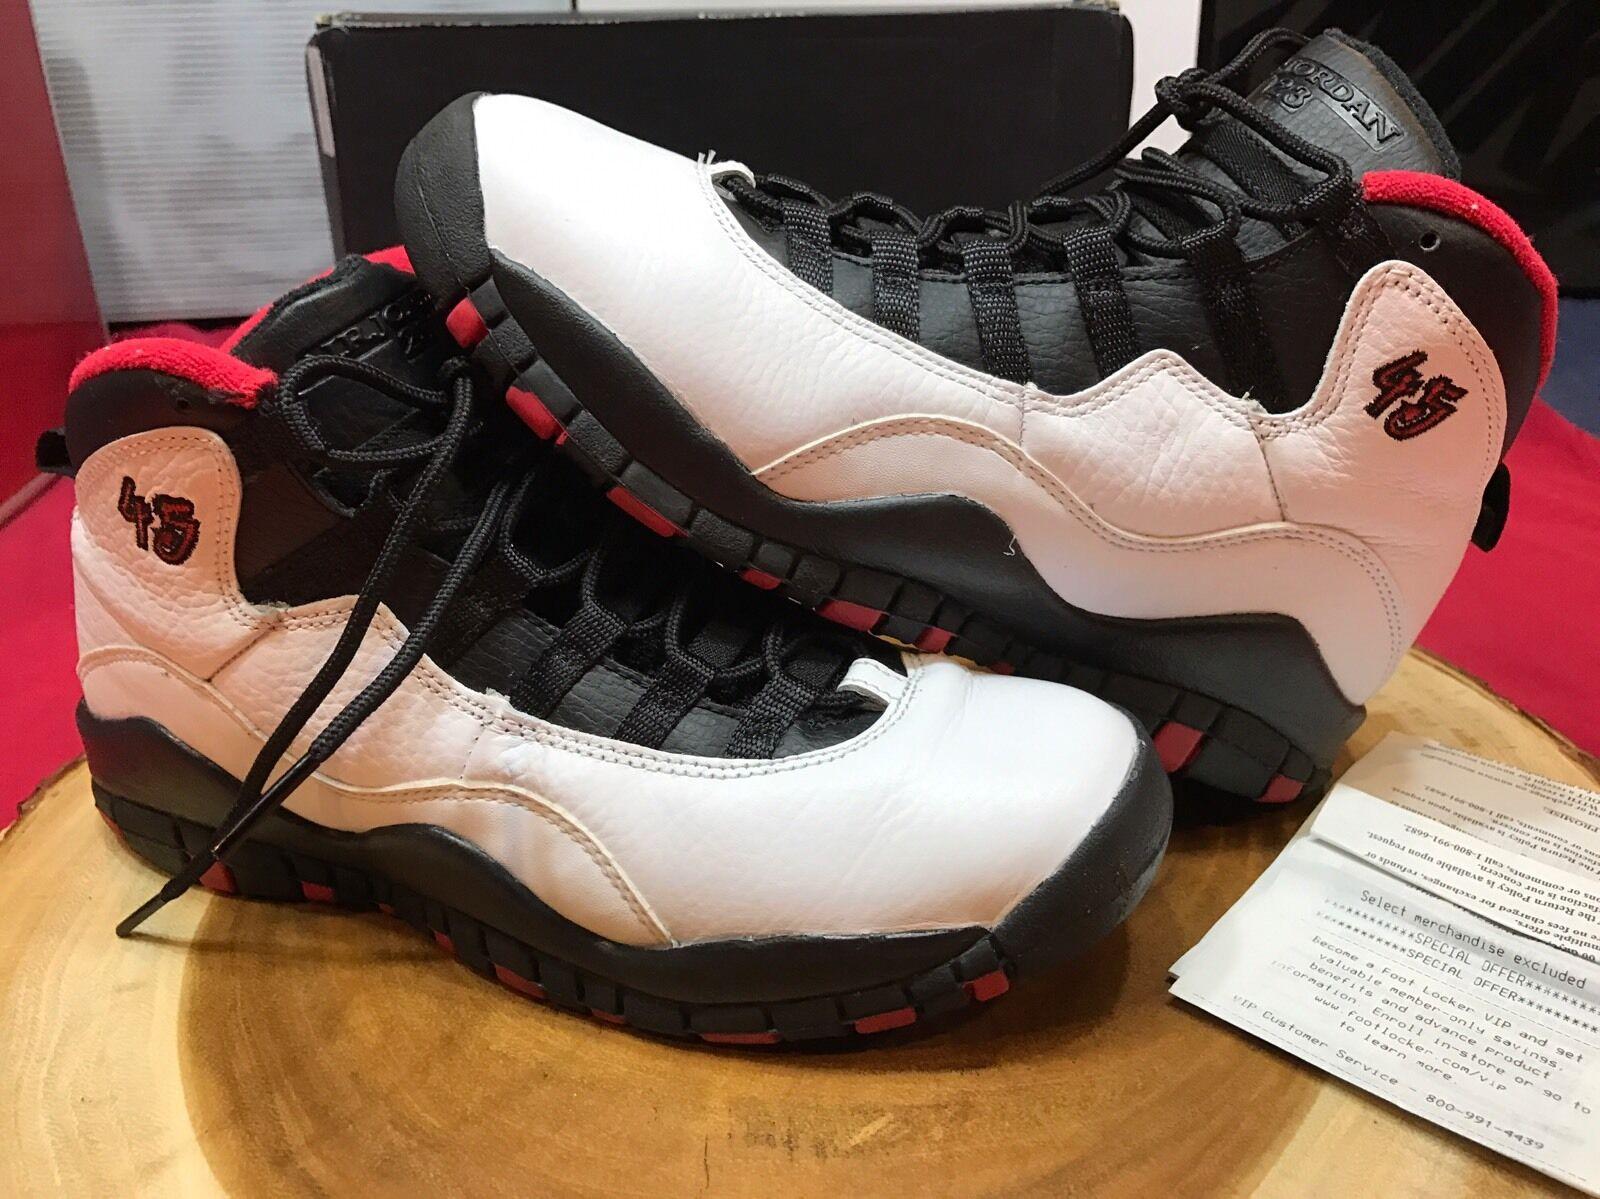 Nike Air Jordan Double Nickel X Comfortable Casual wild